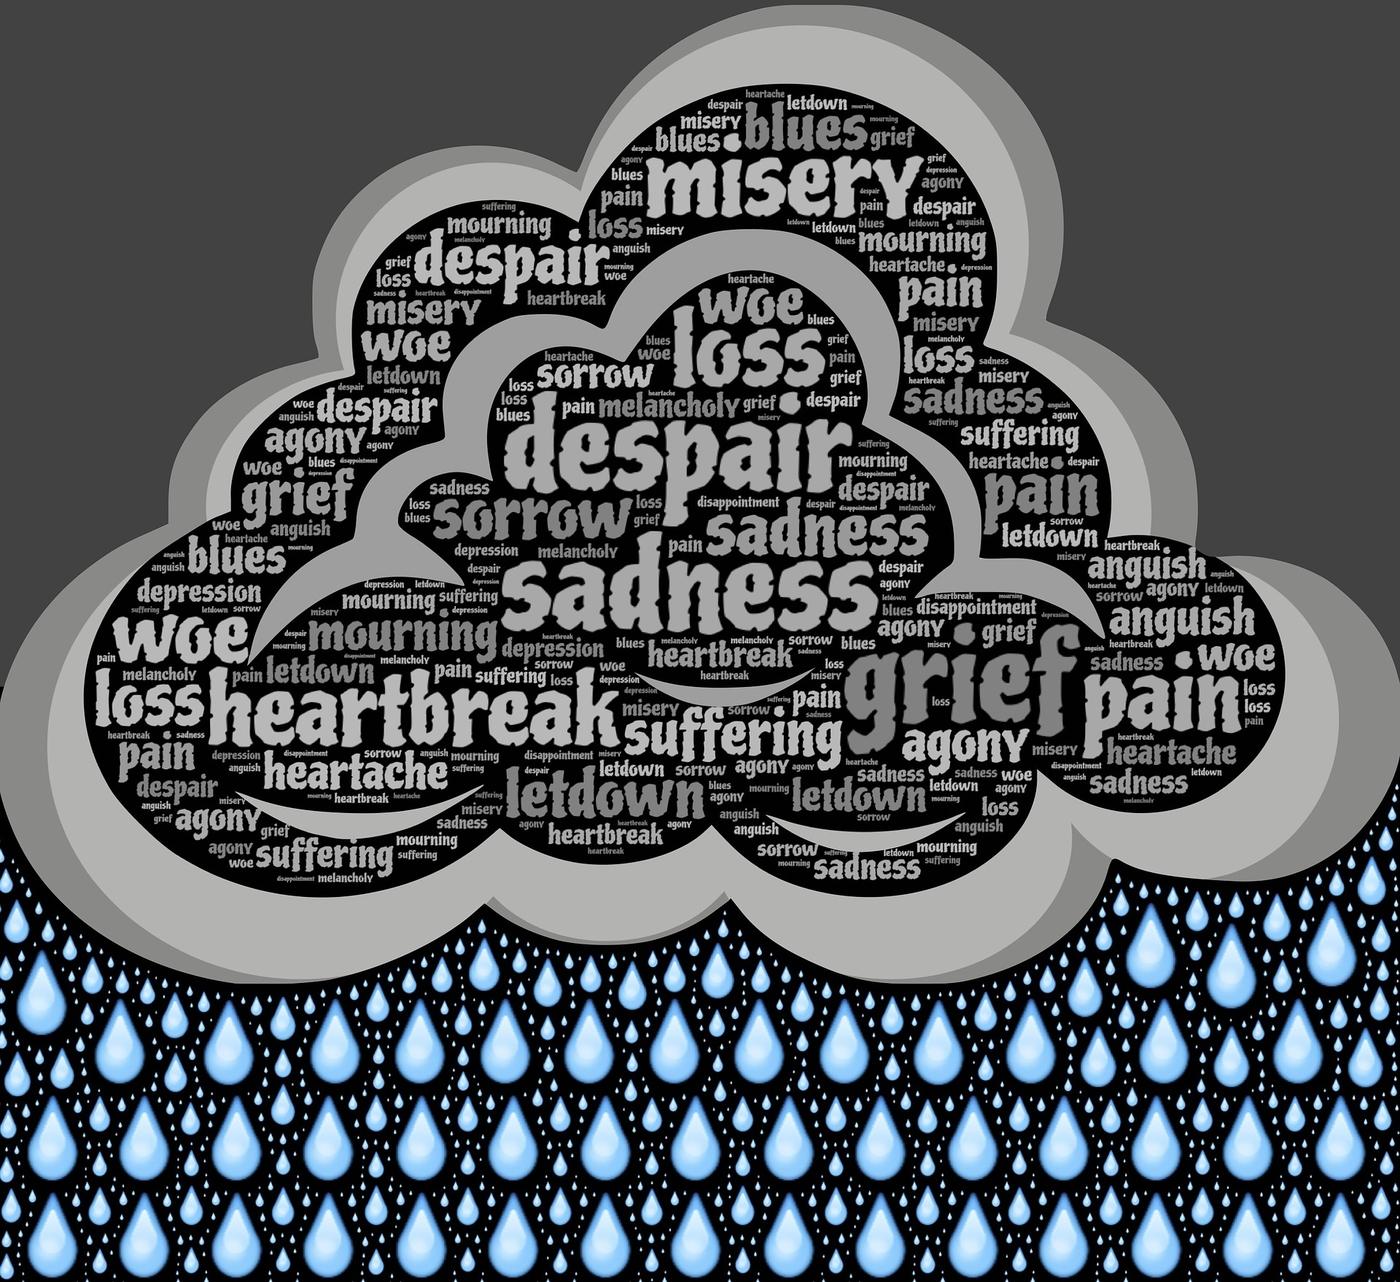 sadness-717432_1920.jpg